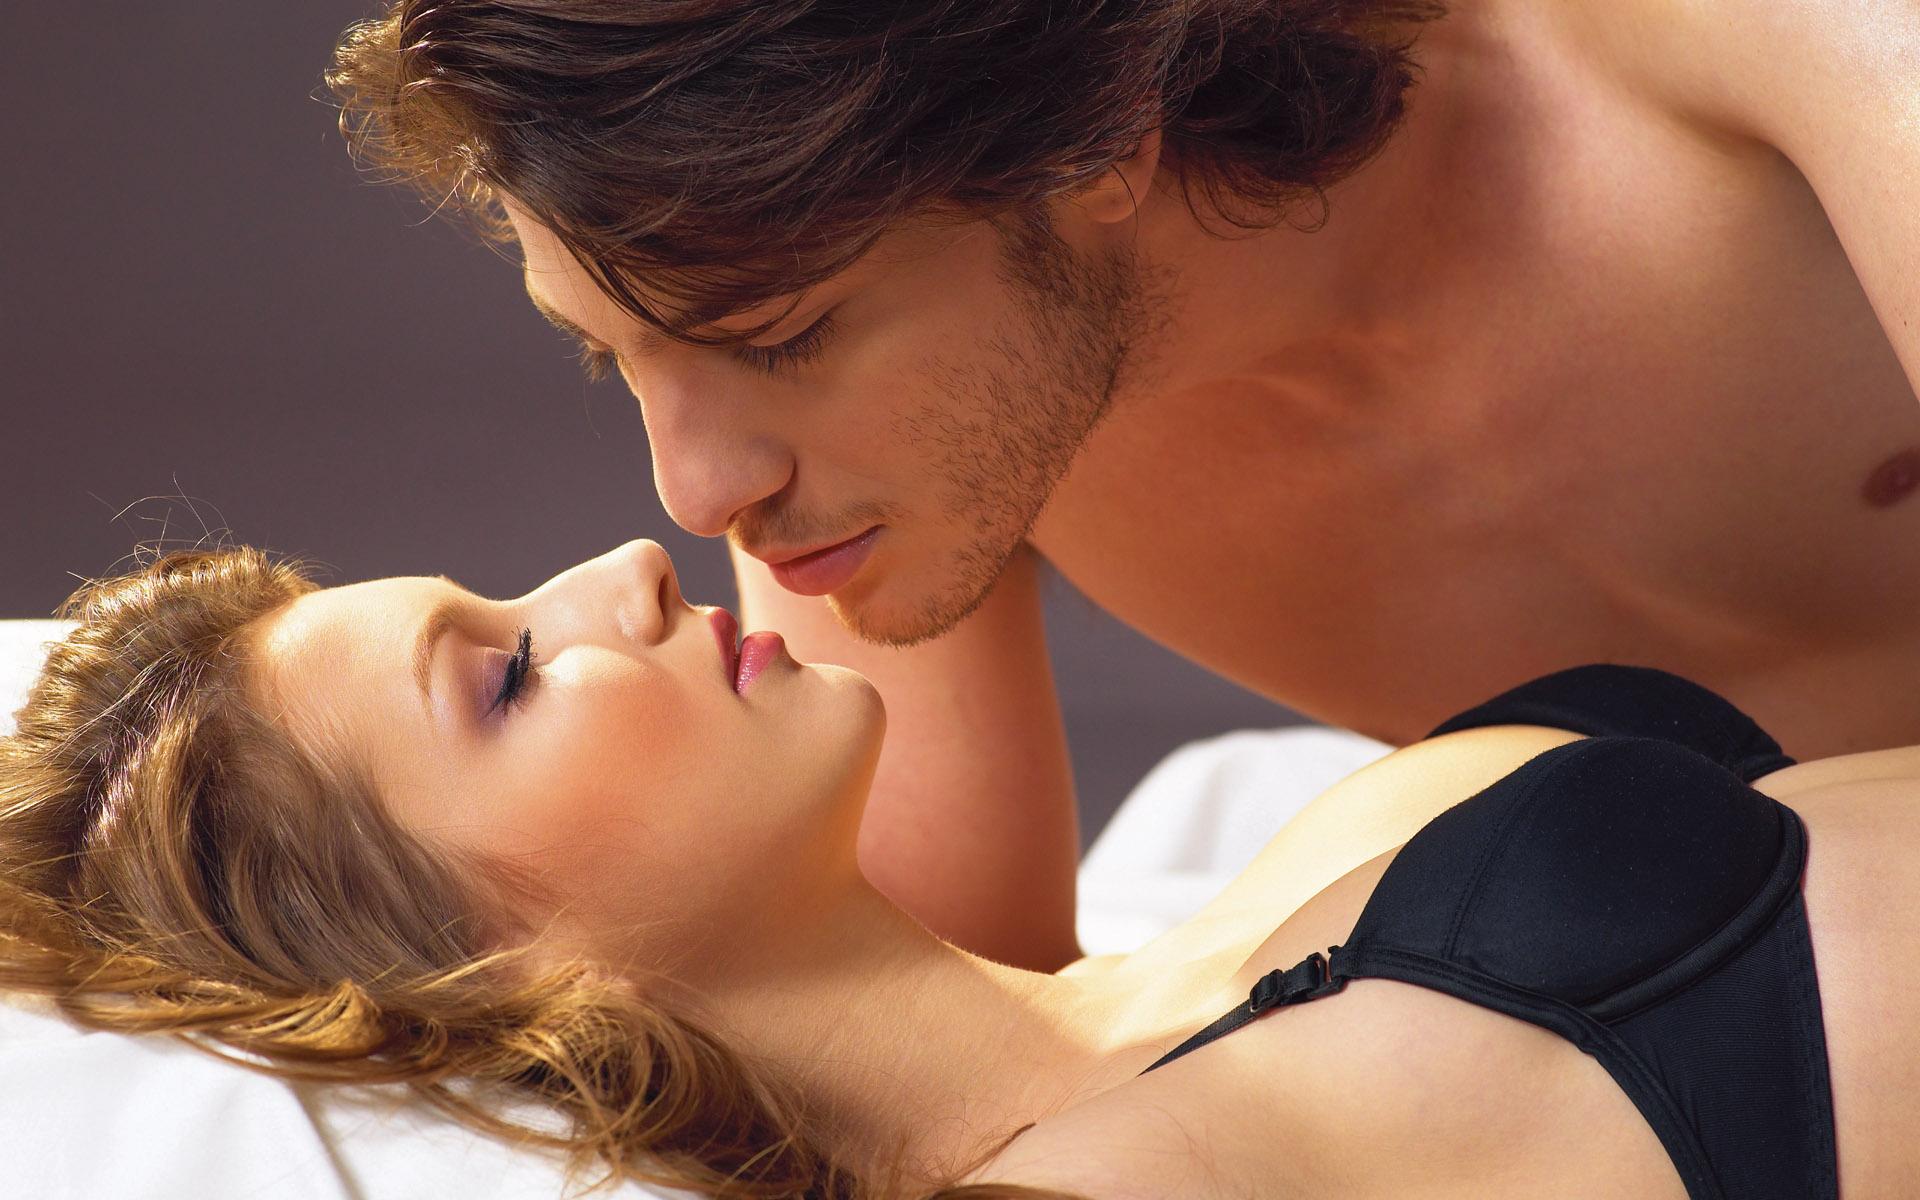 Traveling Kinky Affair Stand Seeking Man Divorced One-night Woman